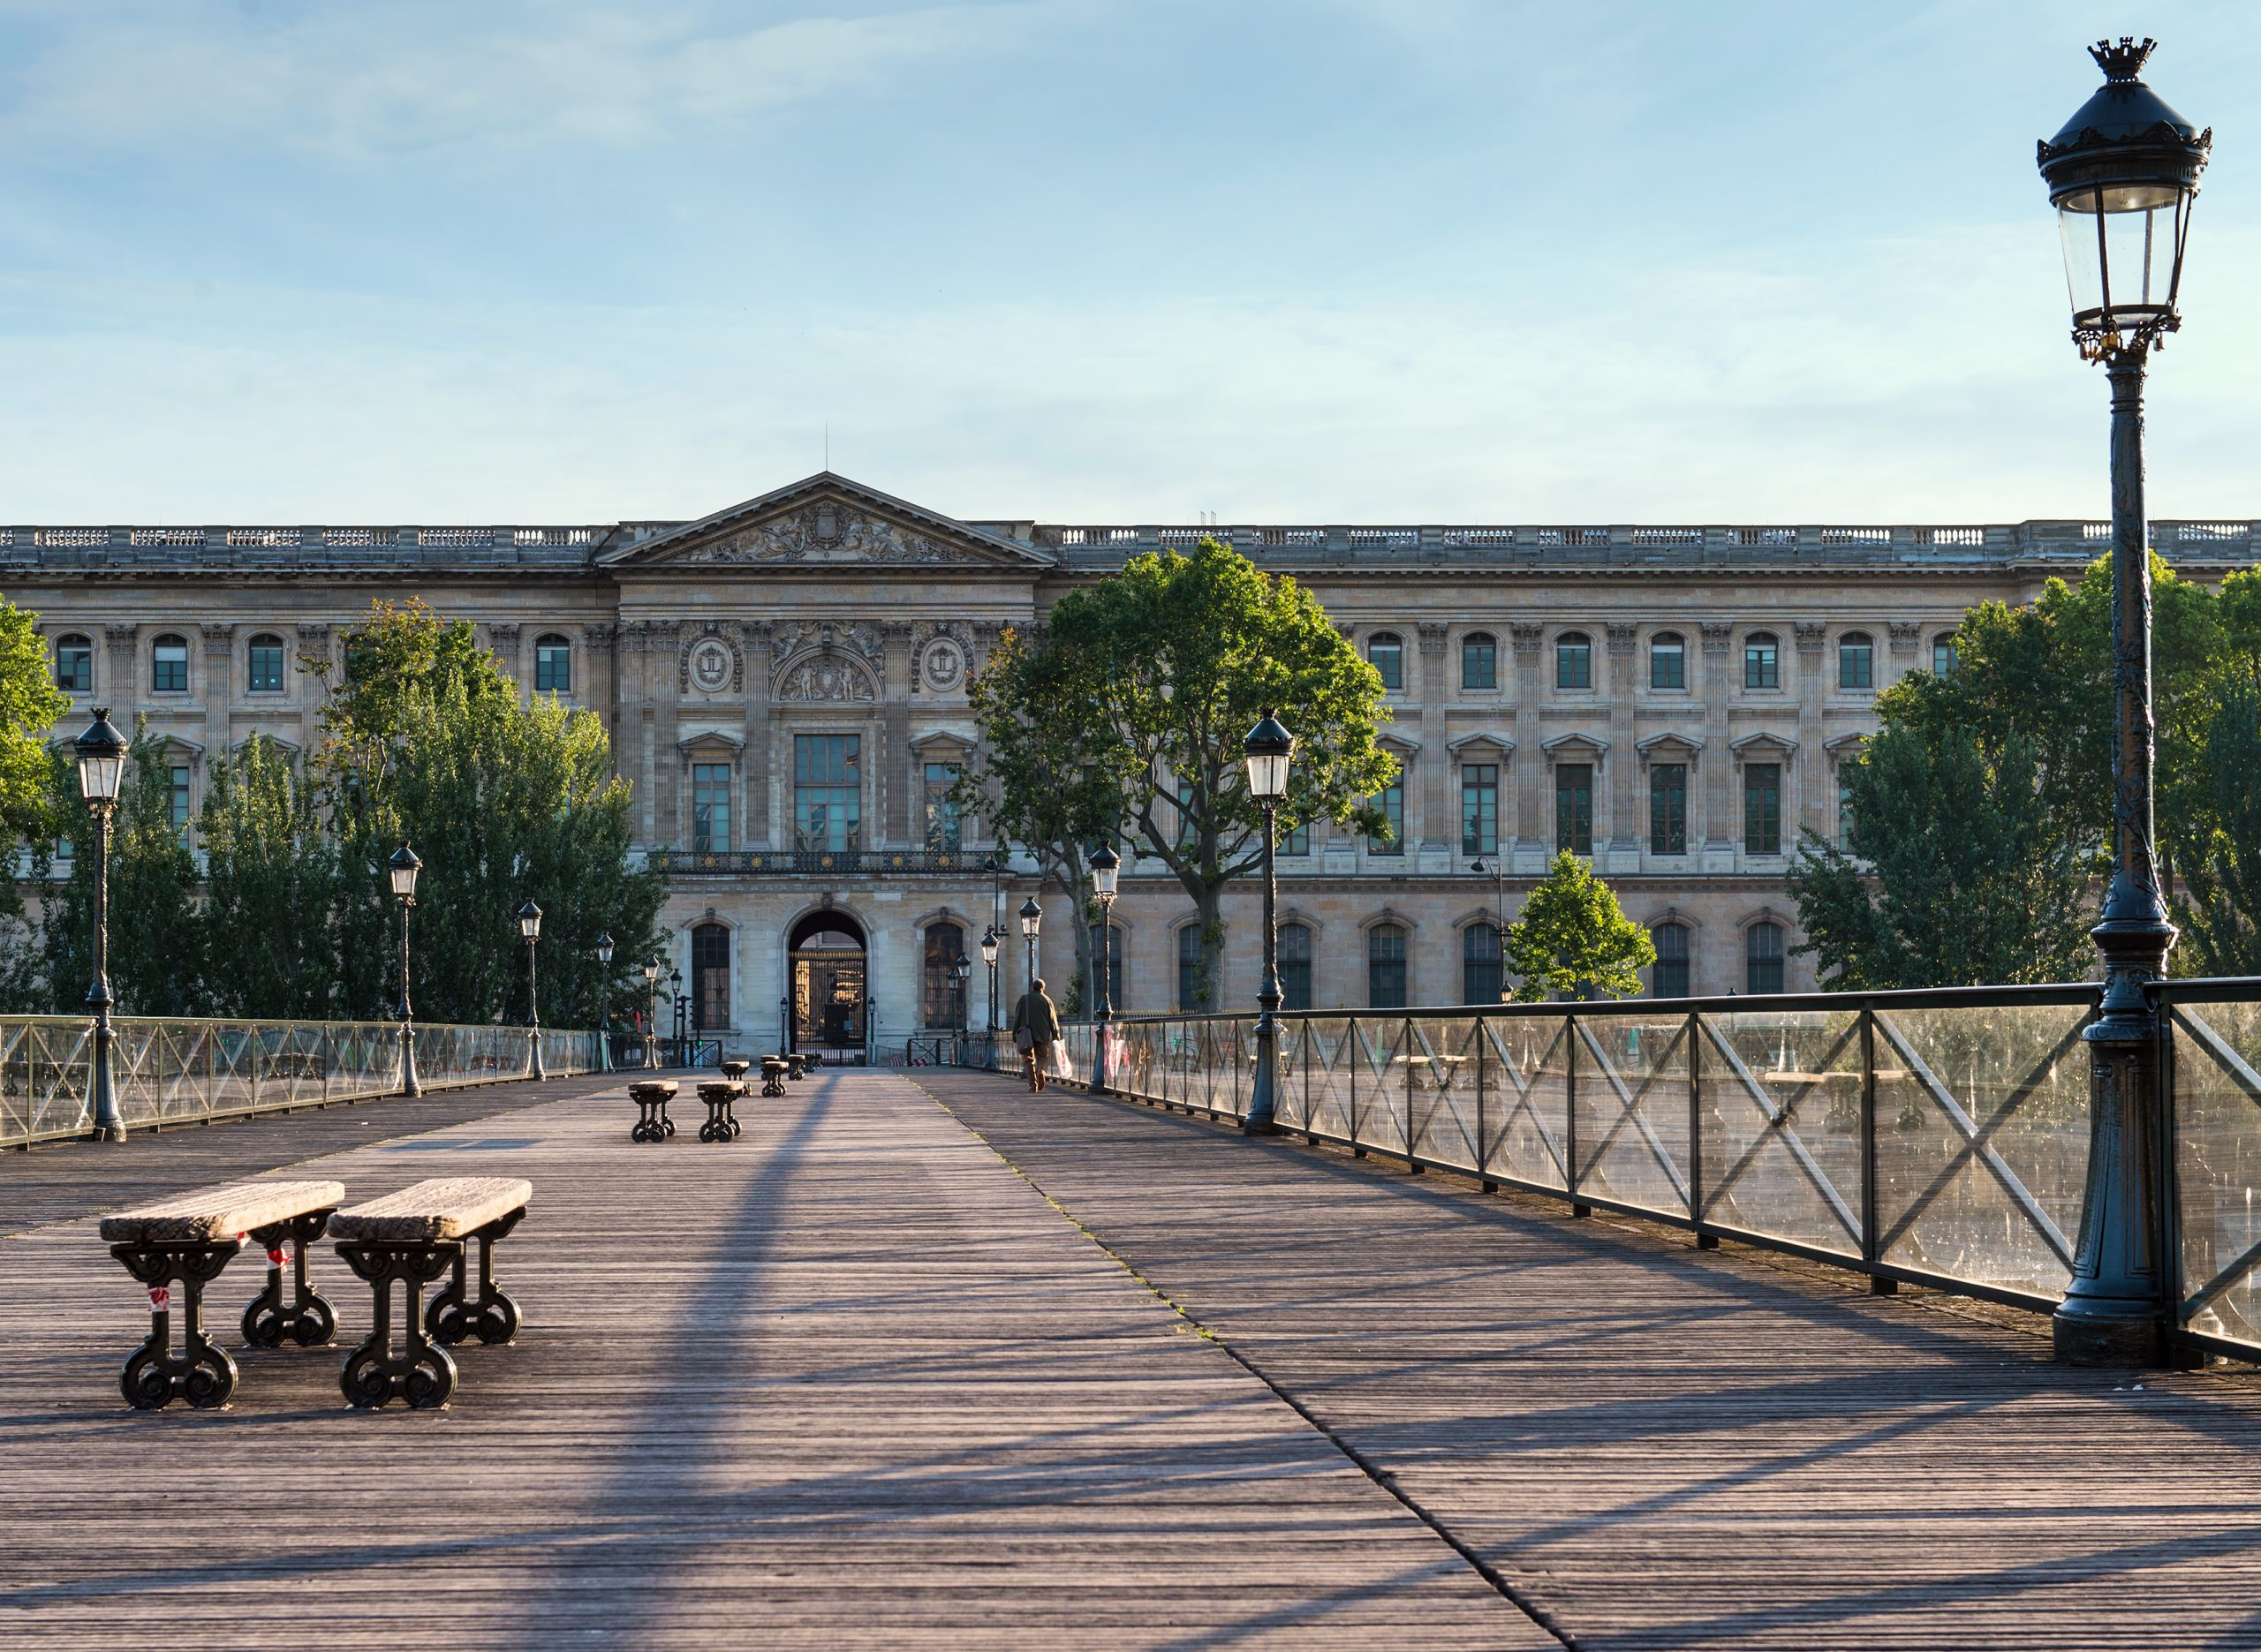 Bridges in Paris Pont de Arts